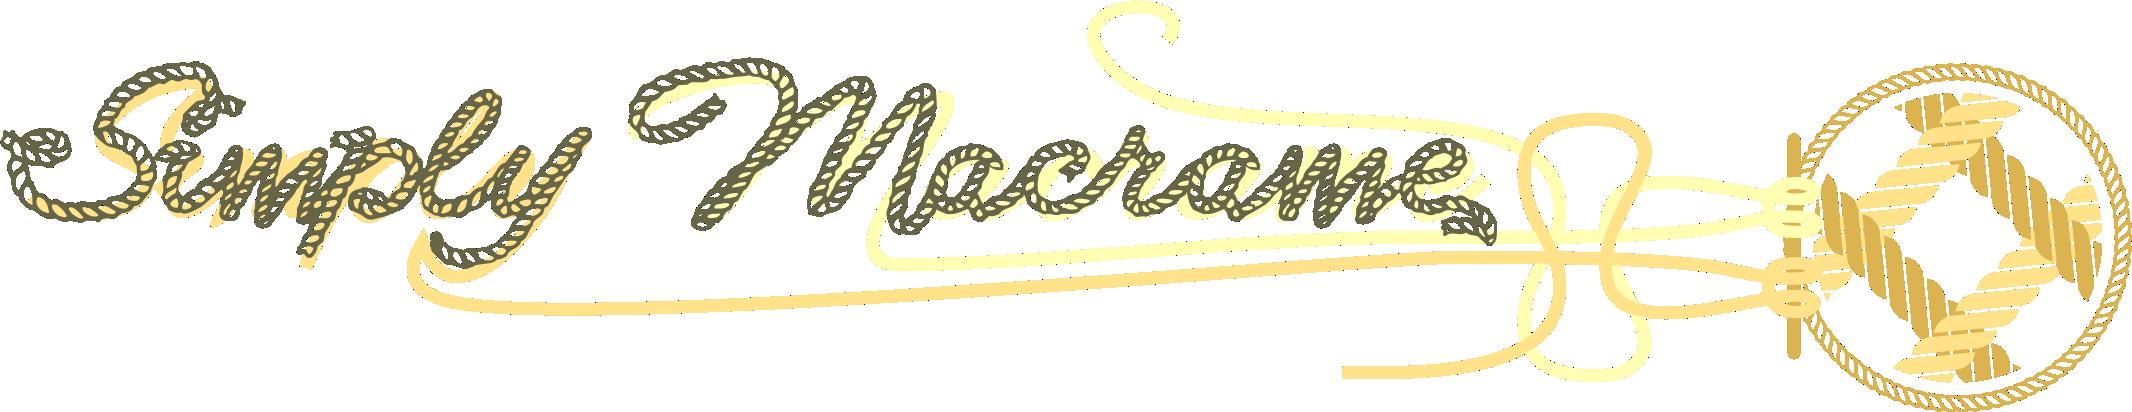 Simply Macrame